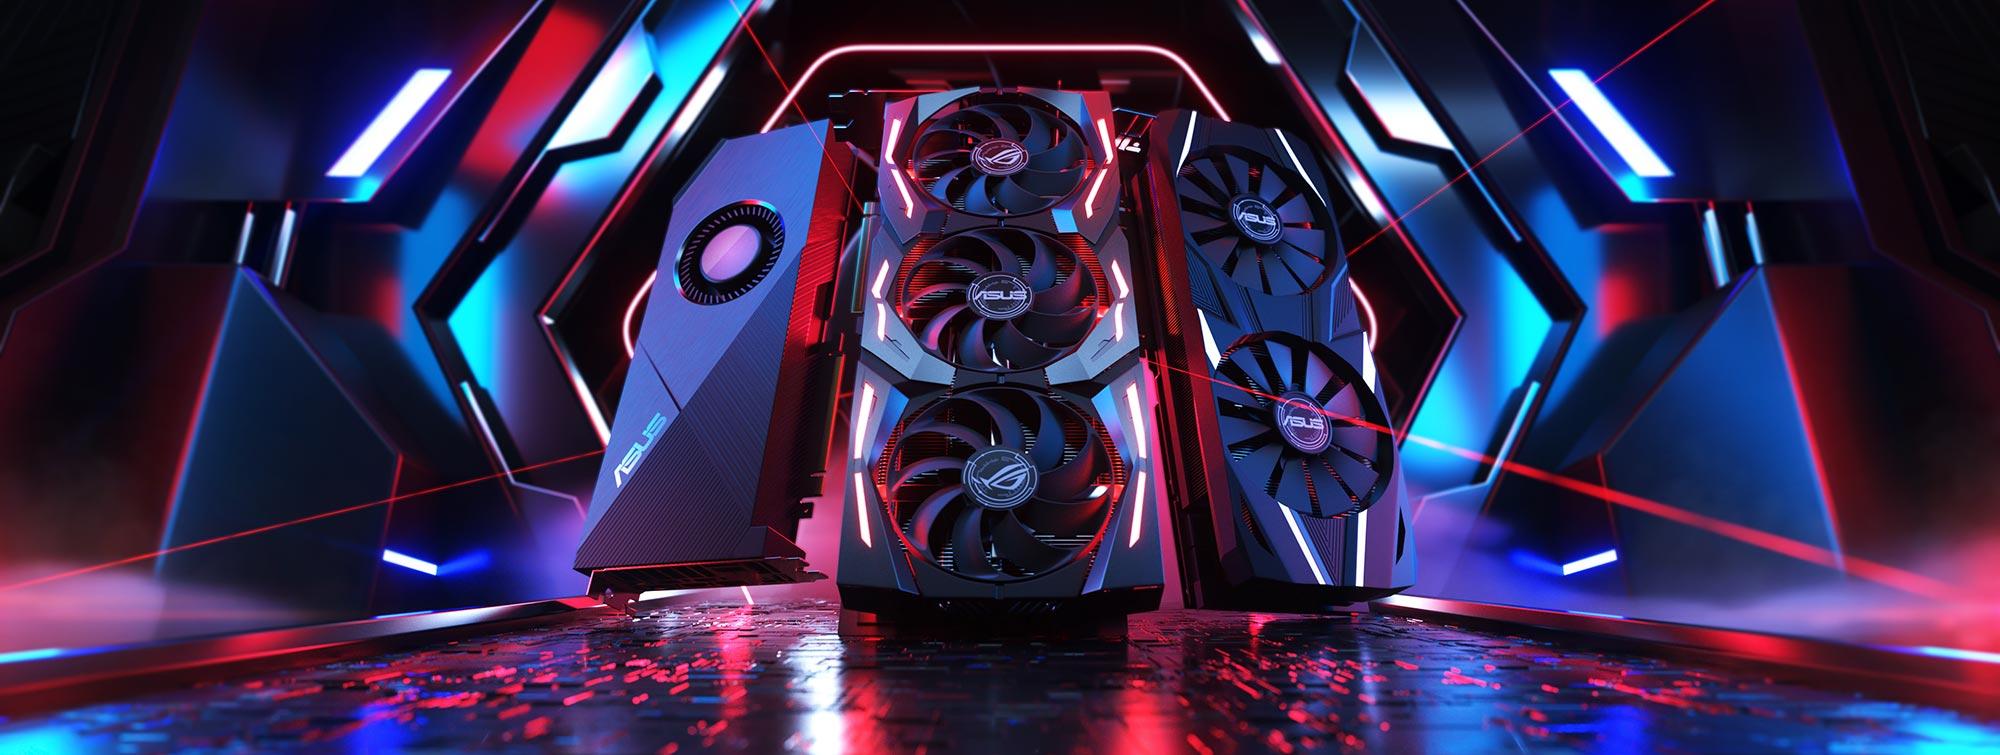 Nvidia Geforce Rtx 20 Super Amd Radeon Rx 5700 Gpus Leak